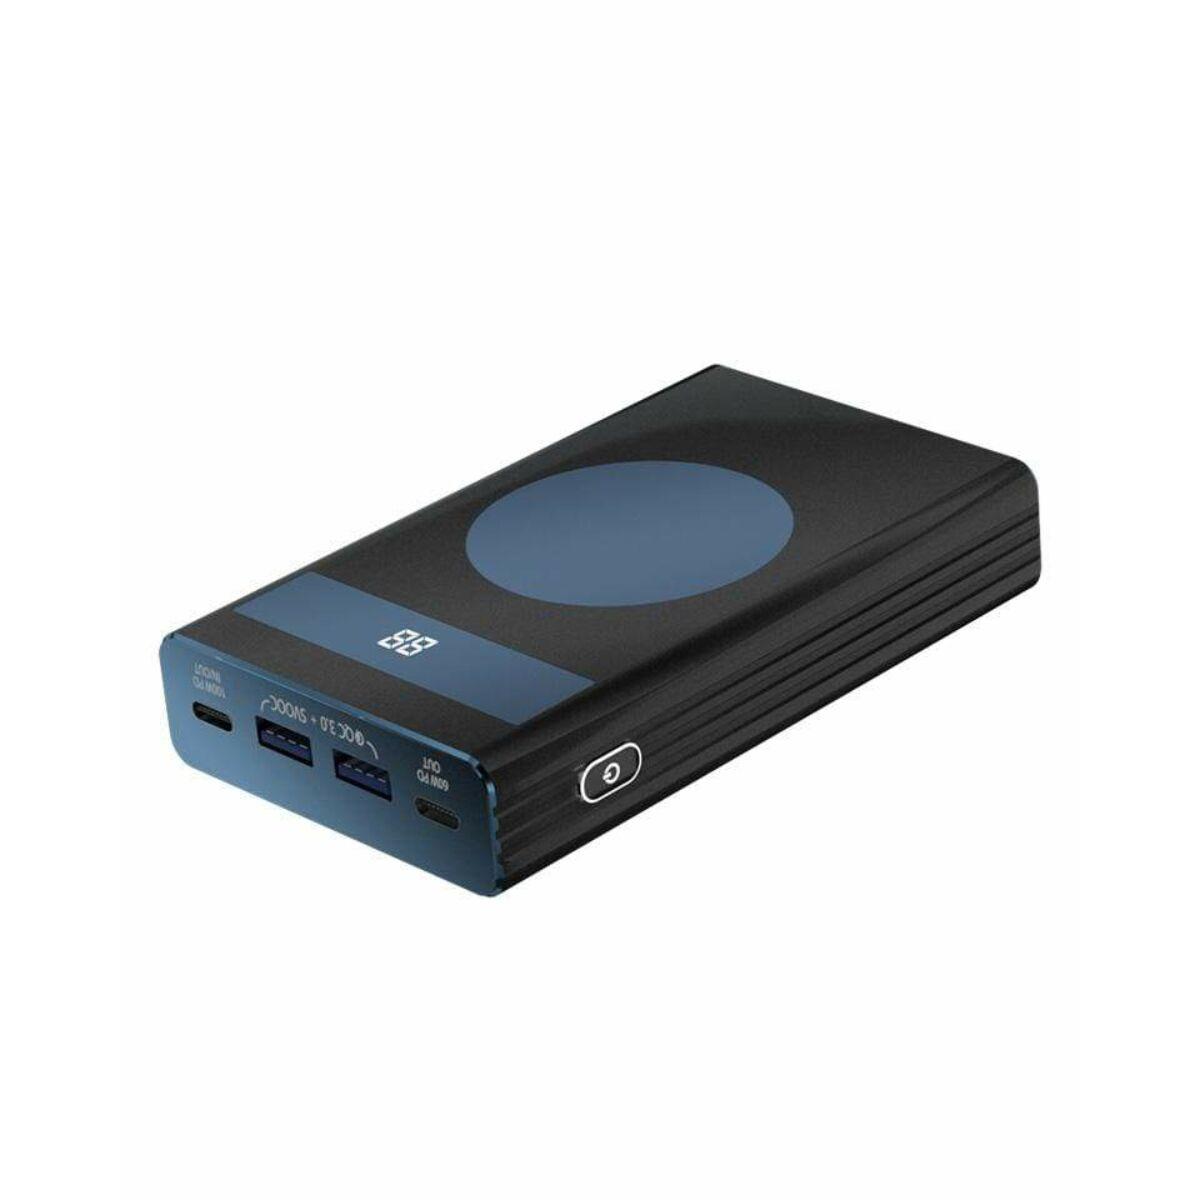 Chargeasap vezeték nélküli powerbank PDQC, 60W, 20.000mAh, fekete kék